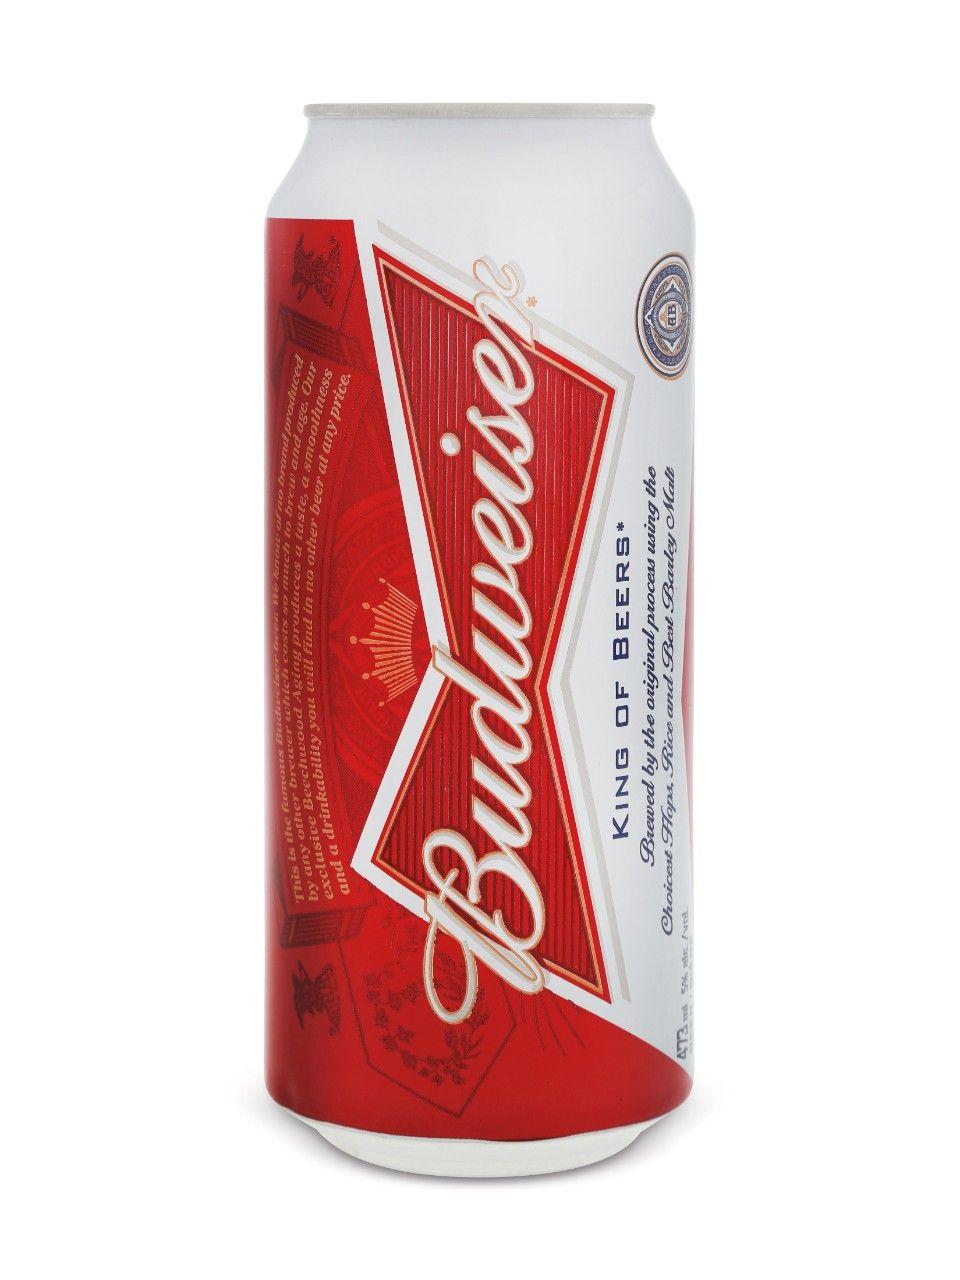 Budweiser Beer Imagens